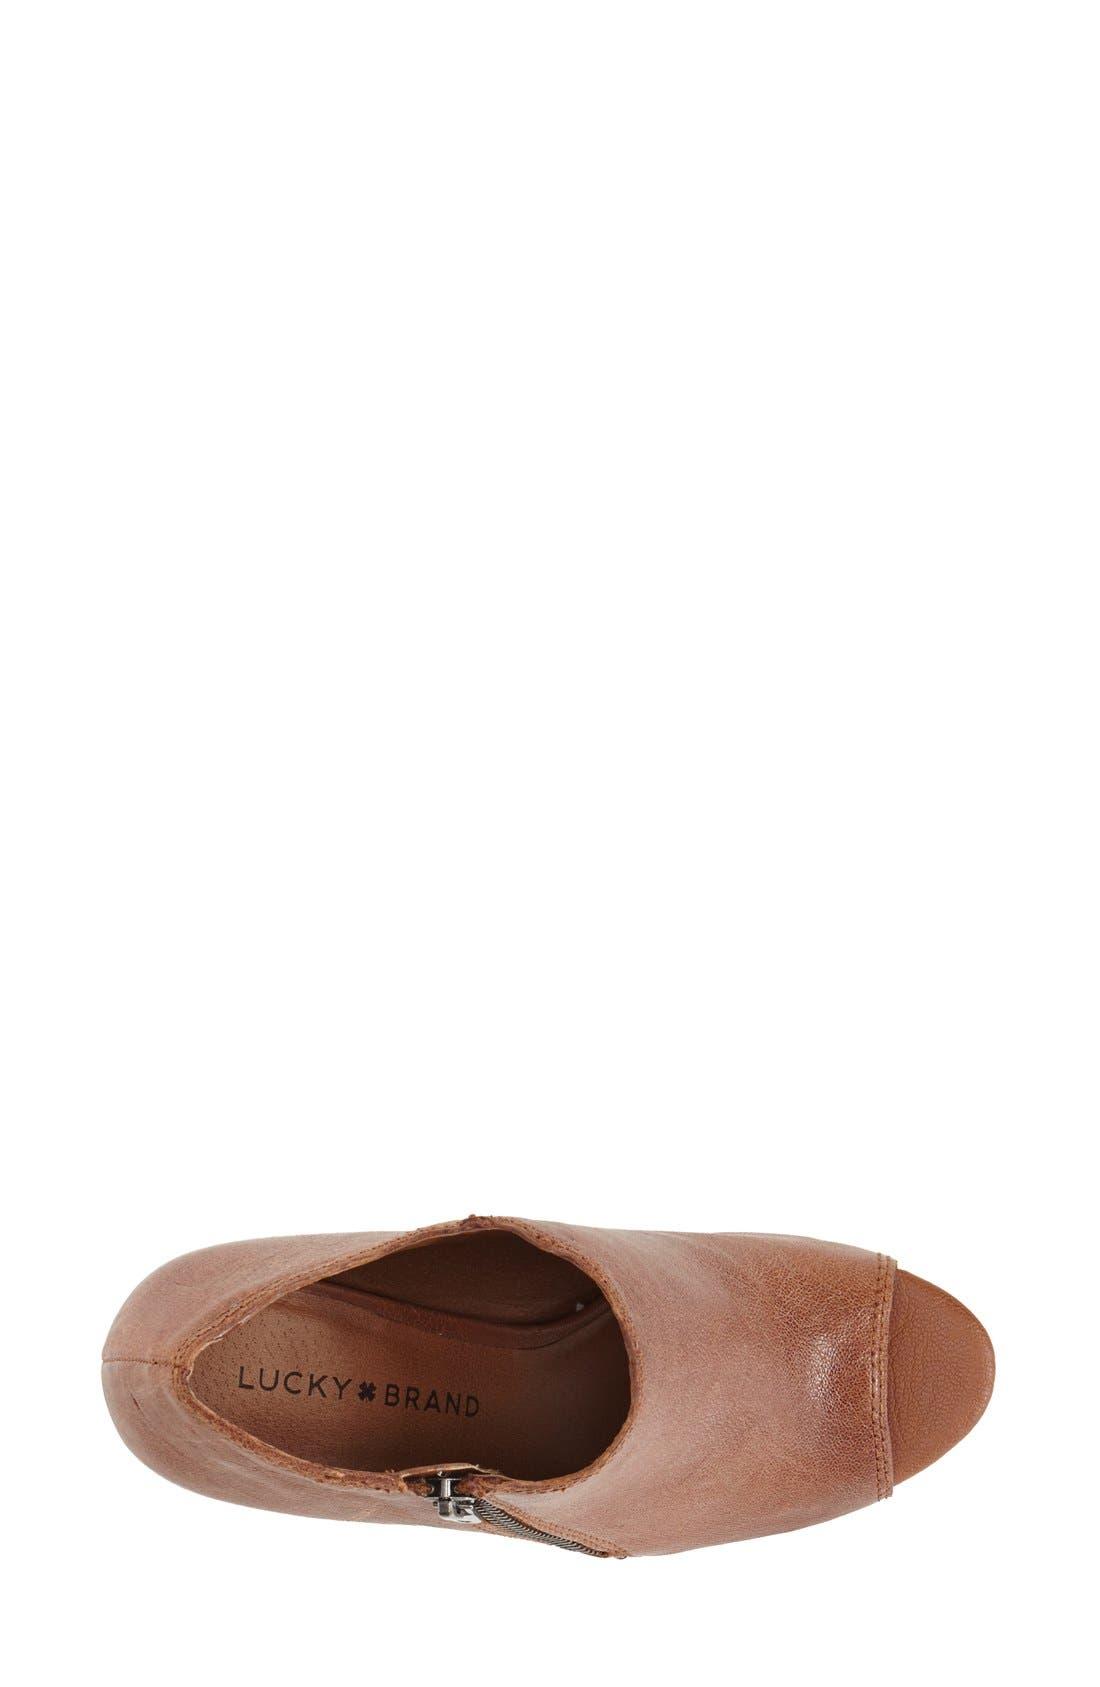 Alternate Image 3  - Lucky Brand 'Pabla' Open Toe Bootie (Women)